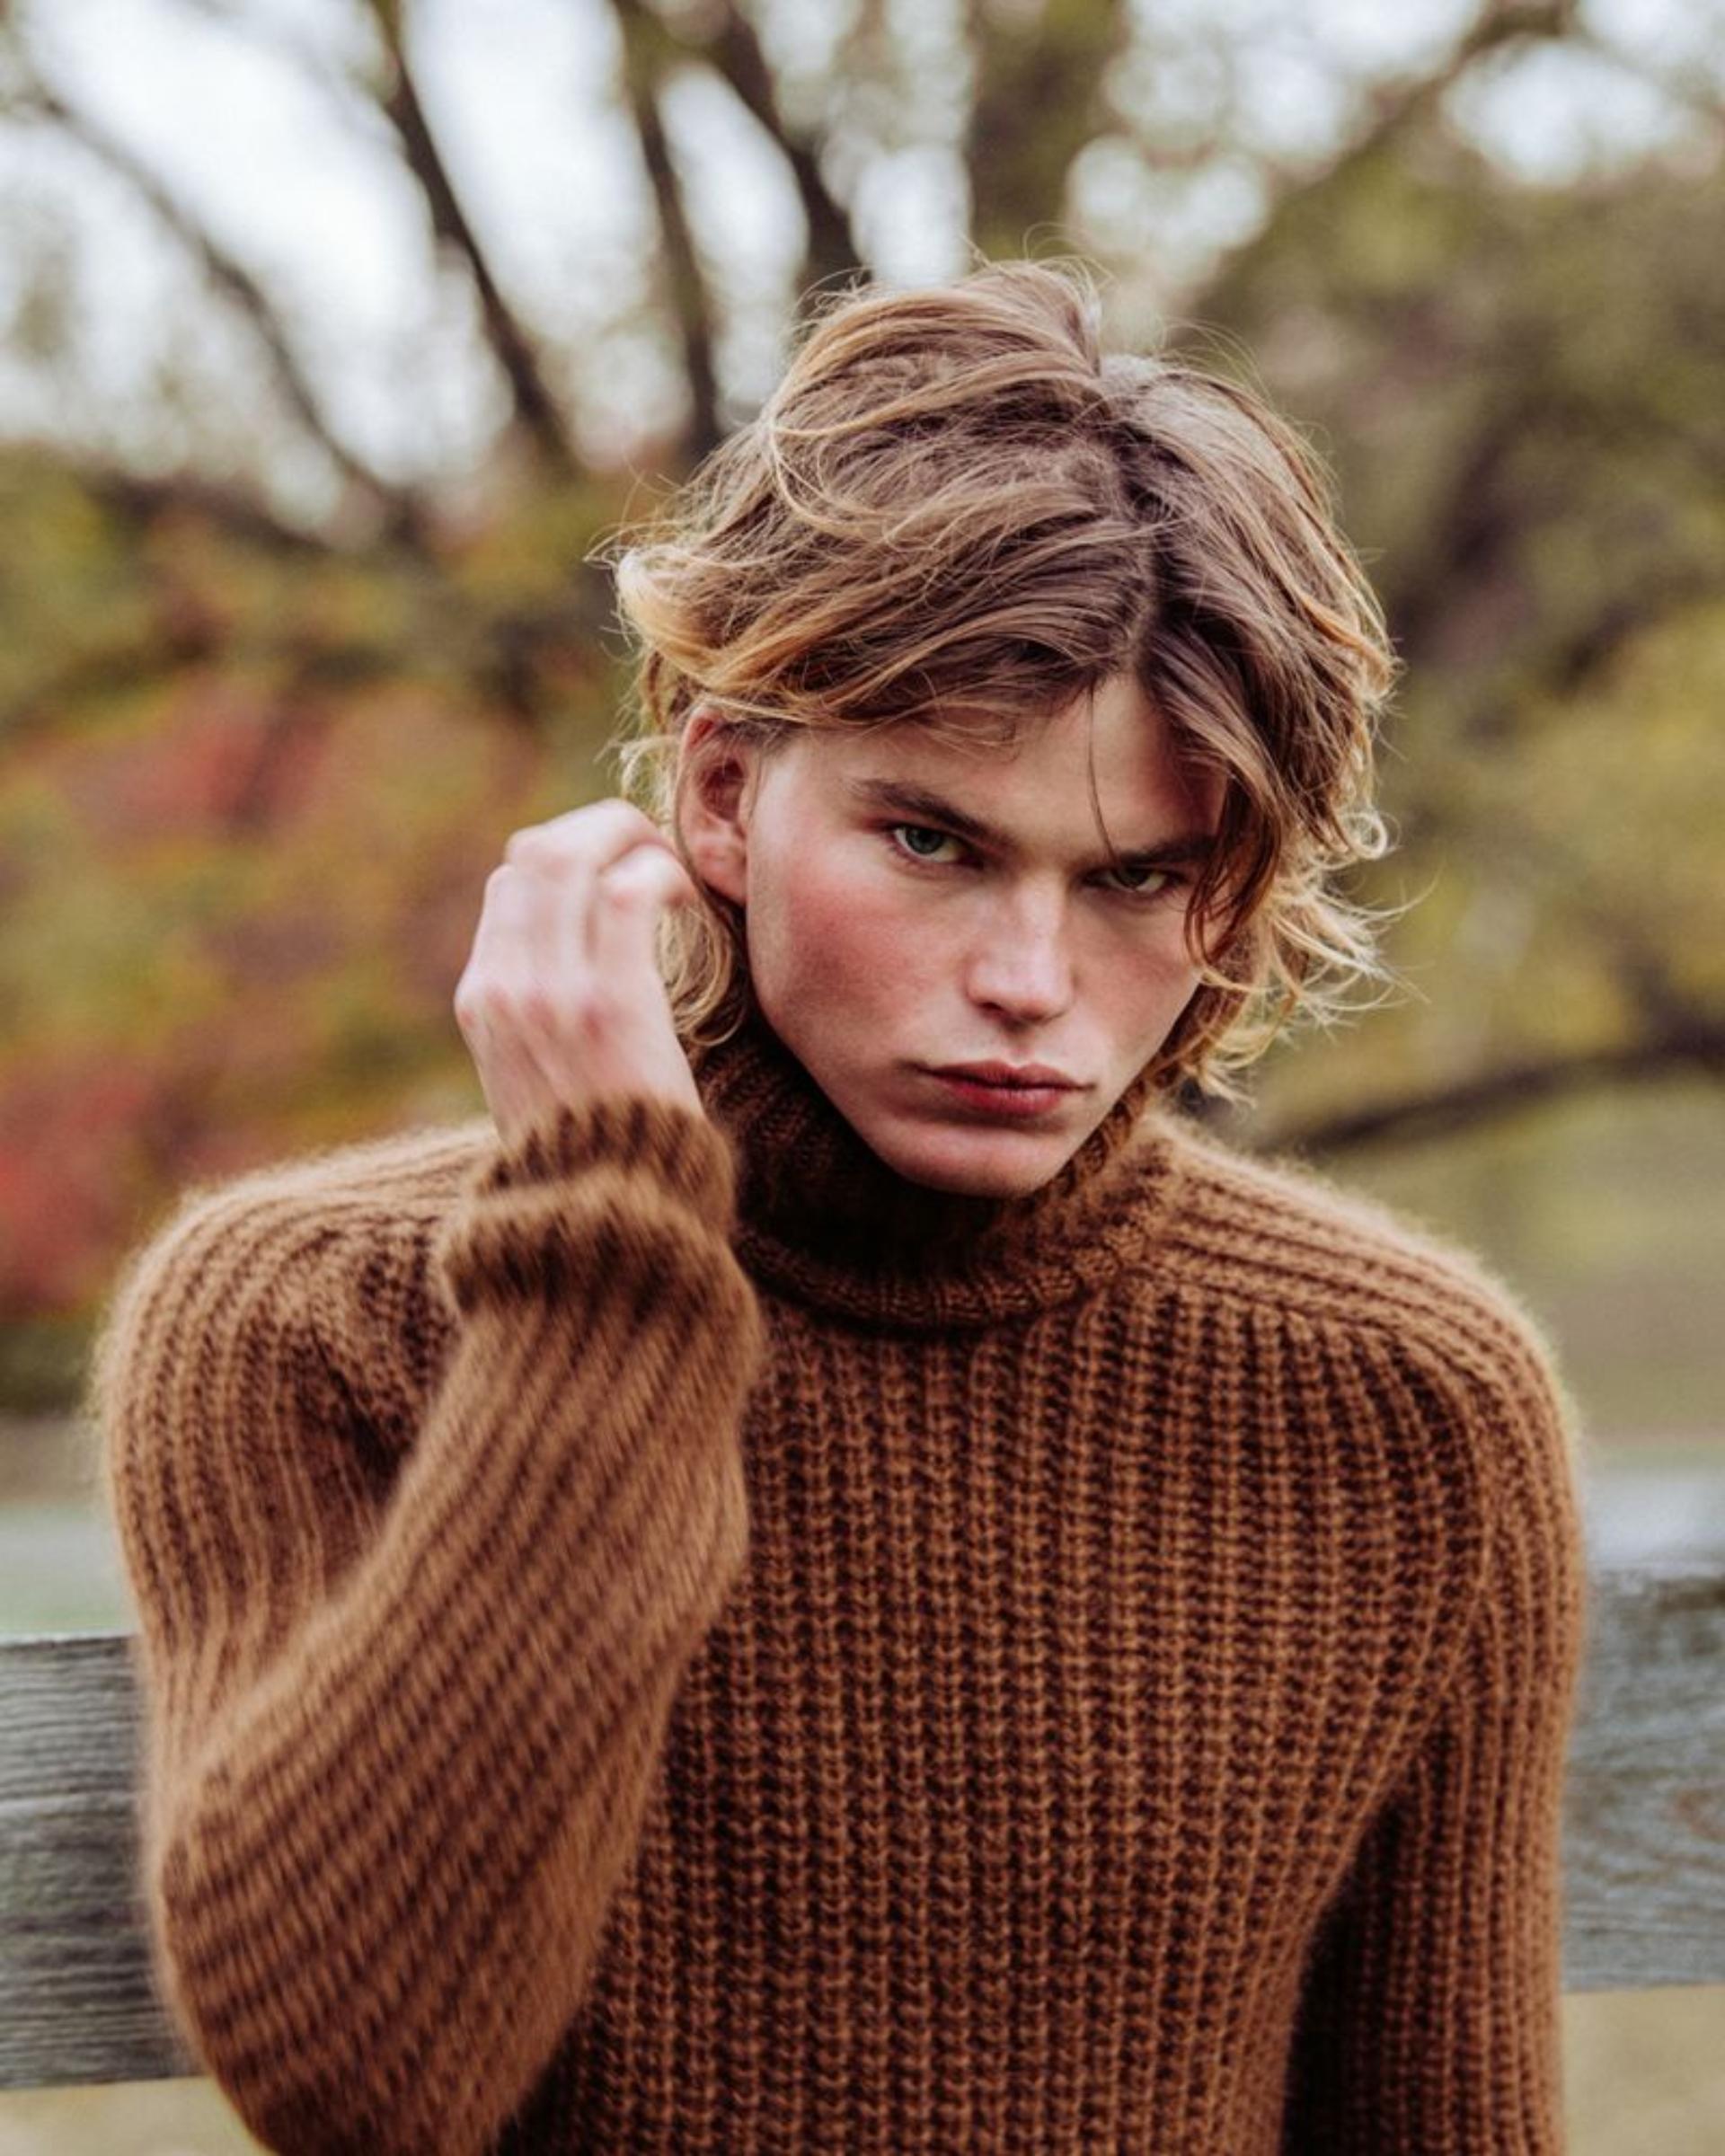 Jordan Barrett el joven modelo con un rostro exótico